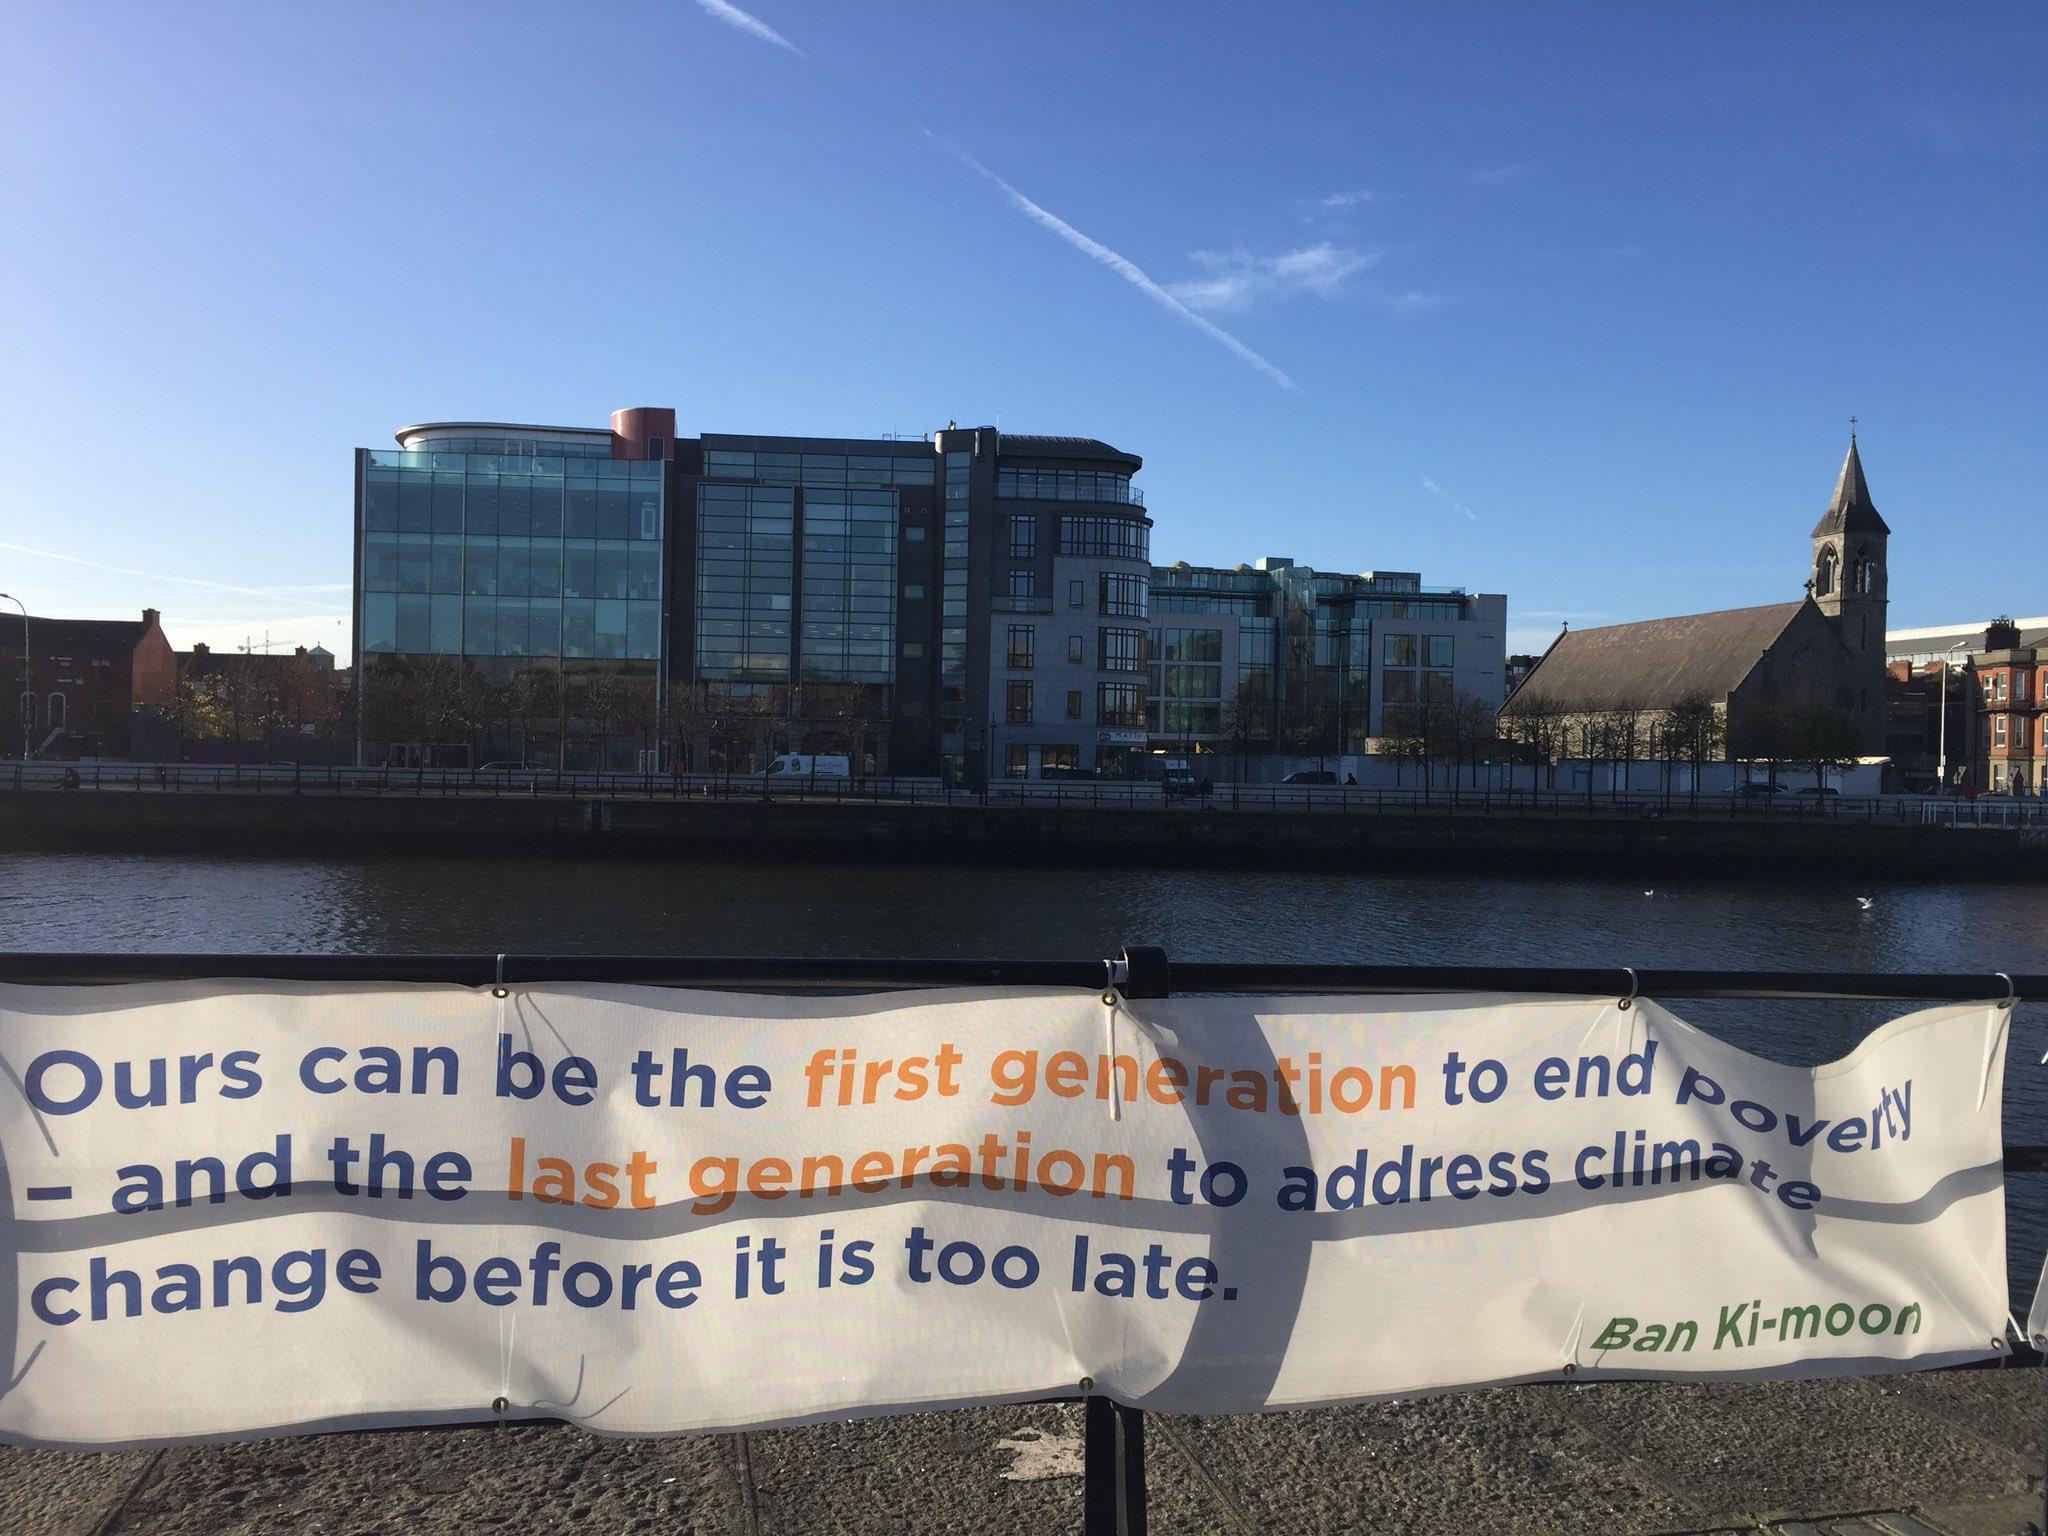 Remembering the #SDGs in Dublin�� #climatechange #cities https://t.co/naN6GSJKHL